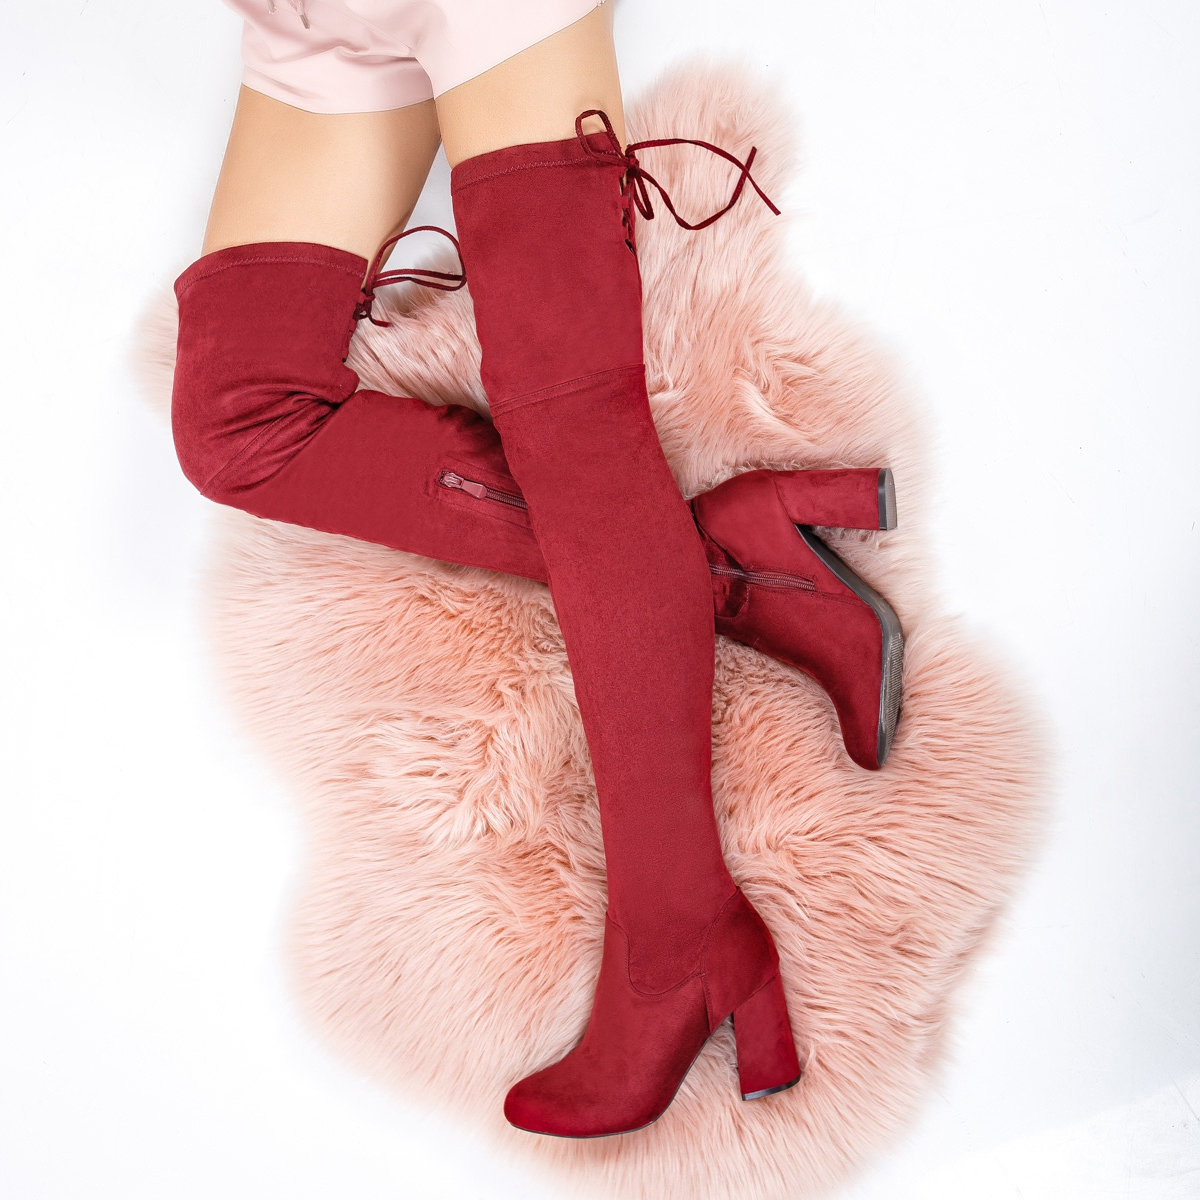 Ce inseamna daca visezi cizme, ghete sau botine (3)